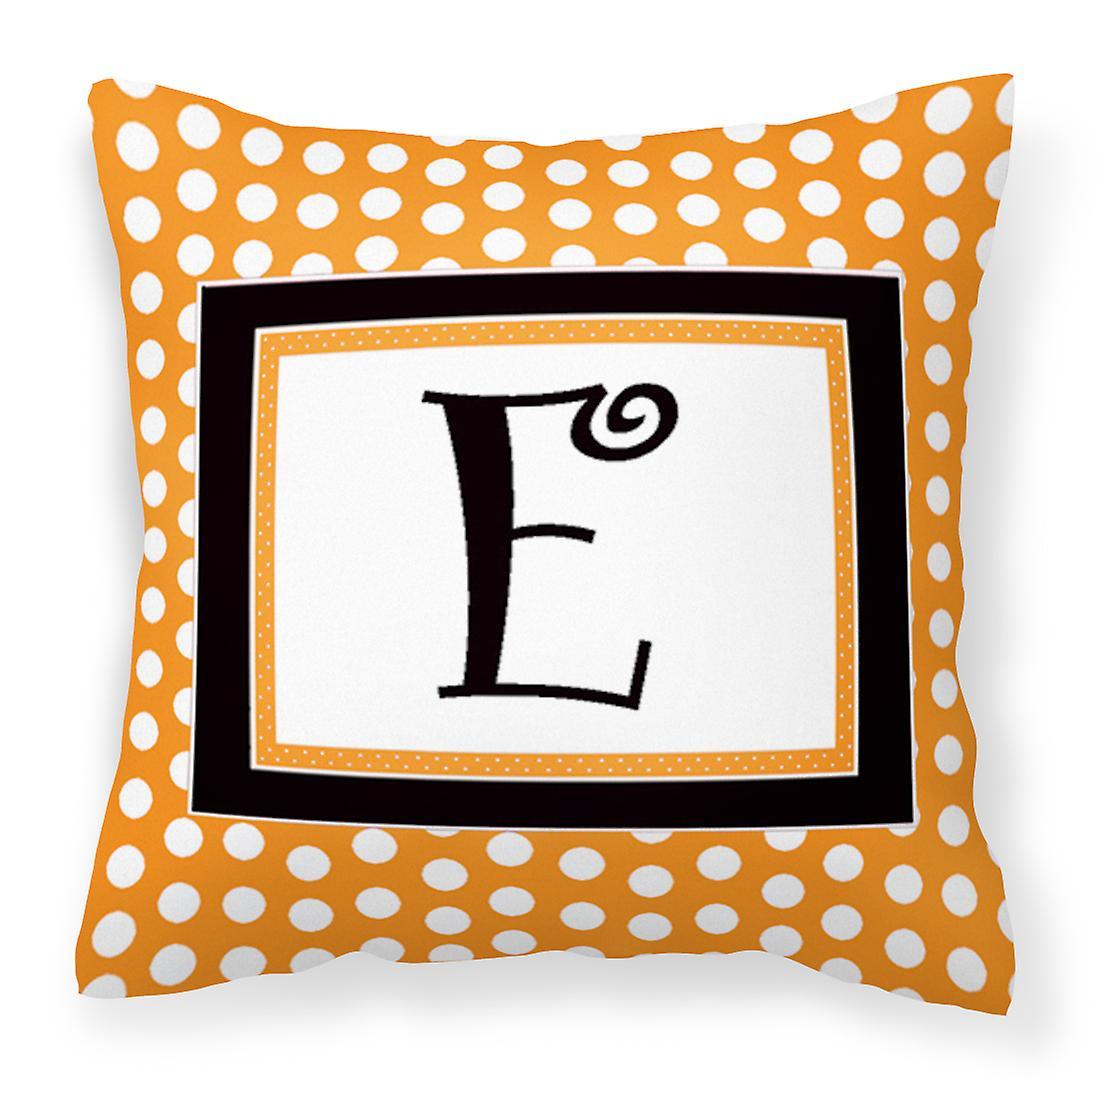 Cj1033 Polkadots Monogramme Décoratif Oreiller Toile E Tissu Initiale Orange UqSzpMV